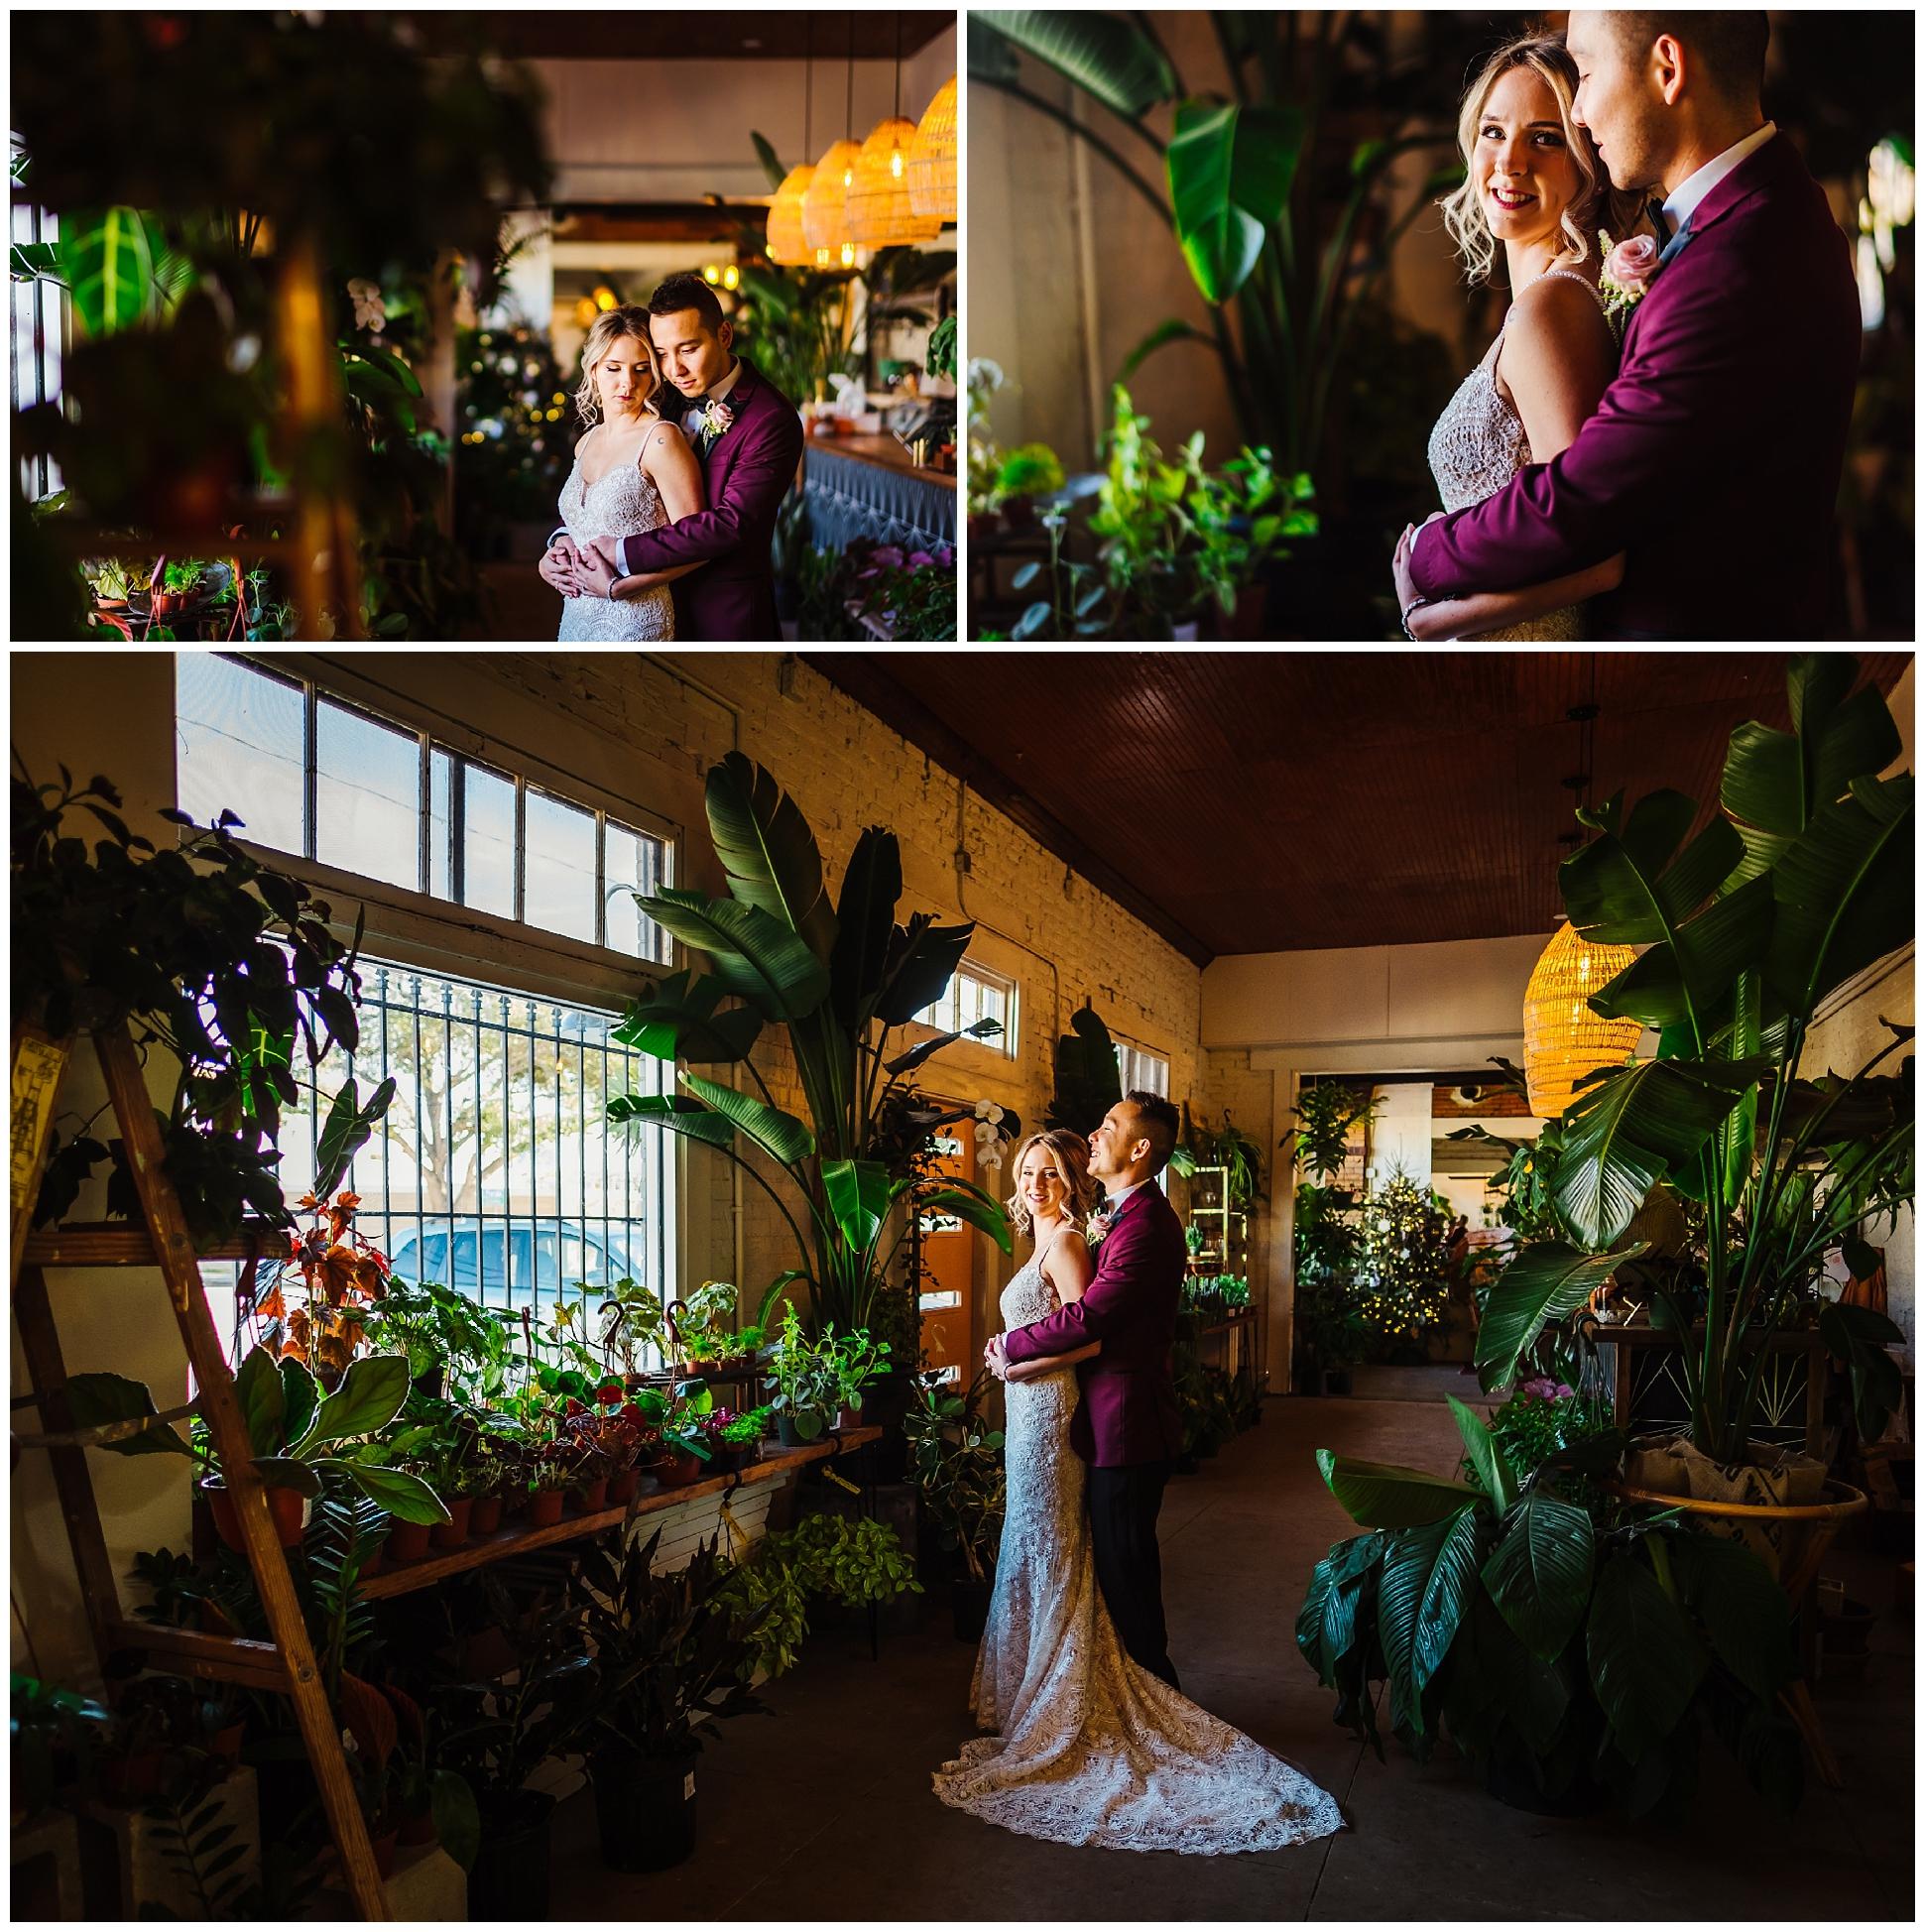 tampa-armeture-wedding-photographer-edgy-industrial-downtown-fancy-free-nursery-tattoo-burgandy-velvet_0030.jpg